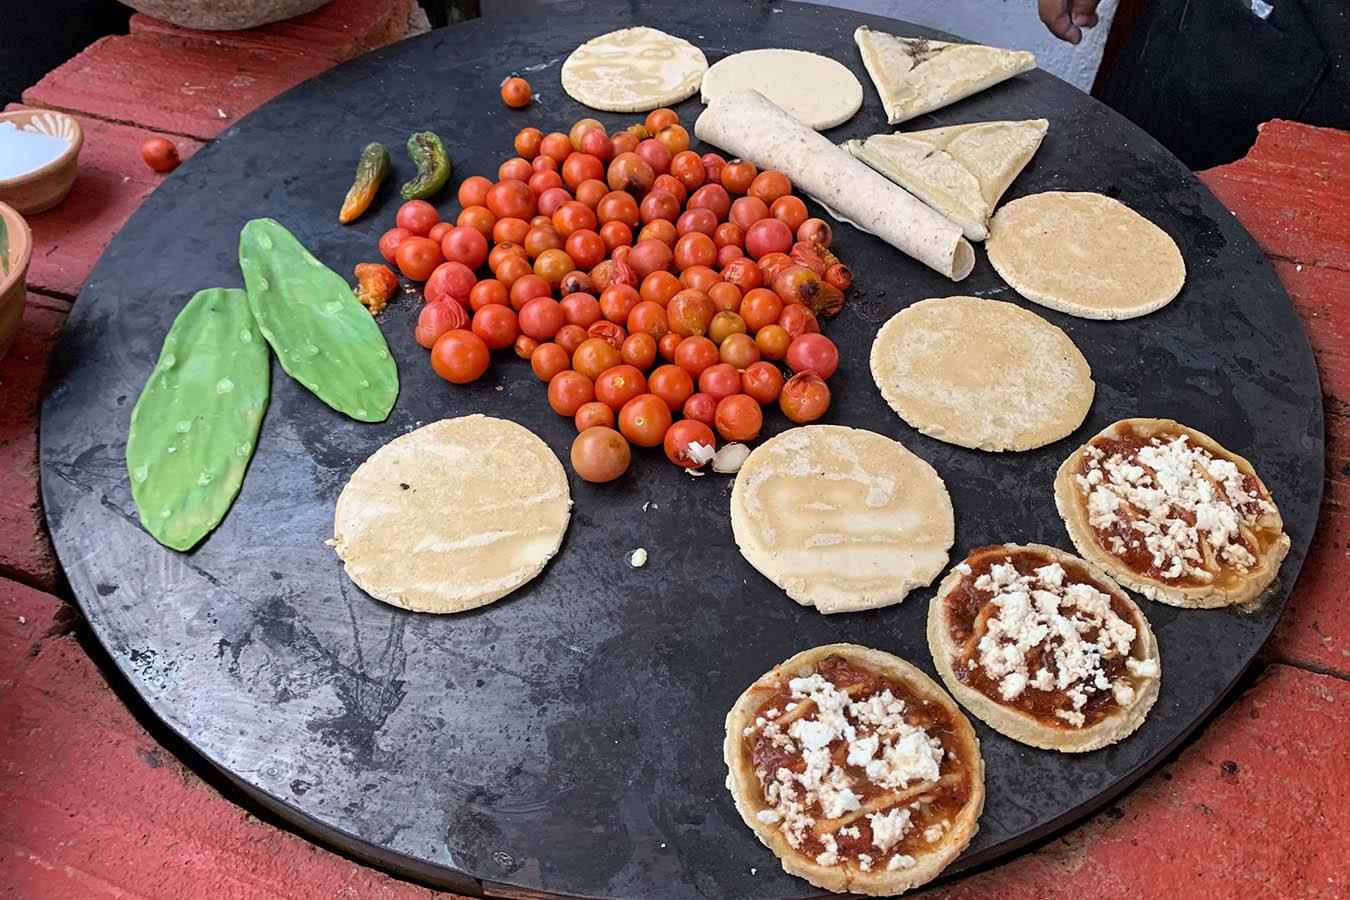 comal para tortillas comal de barro comales mexicanos